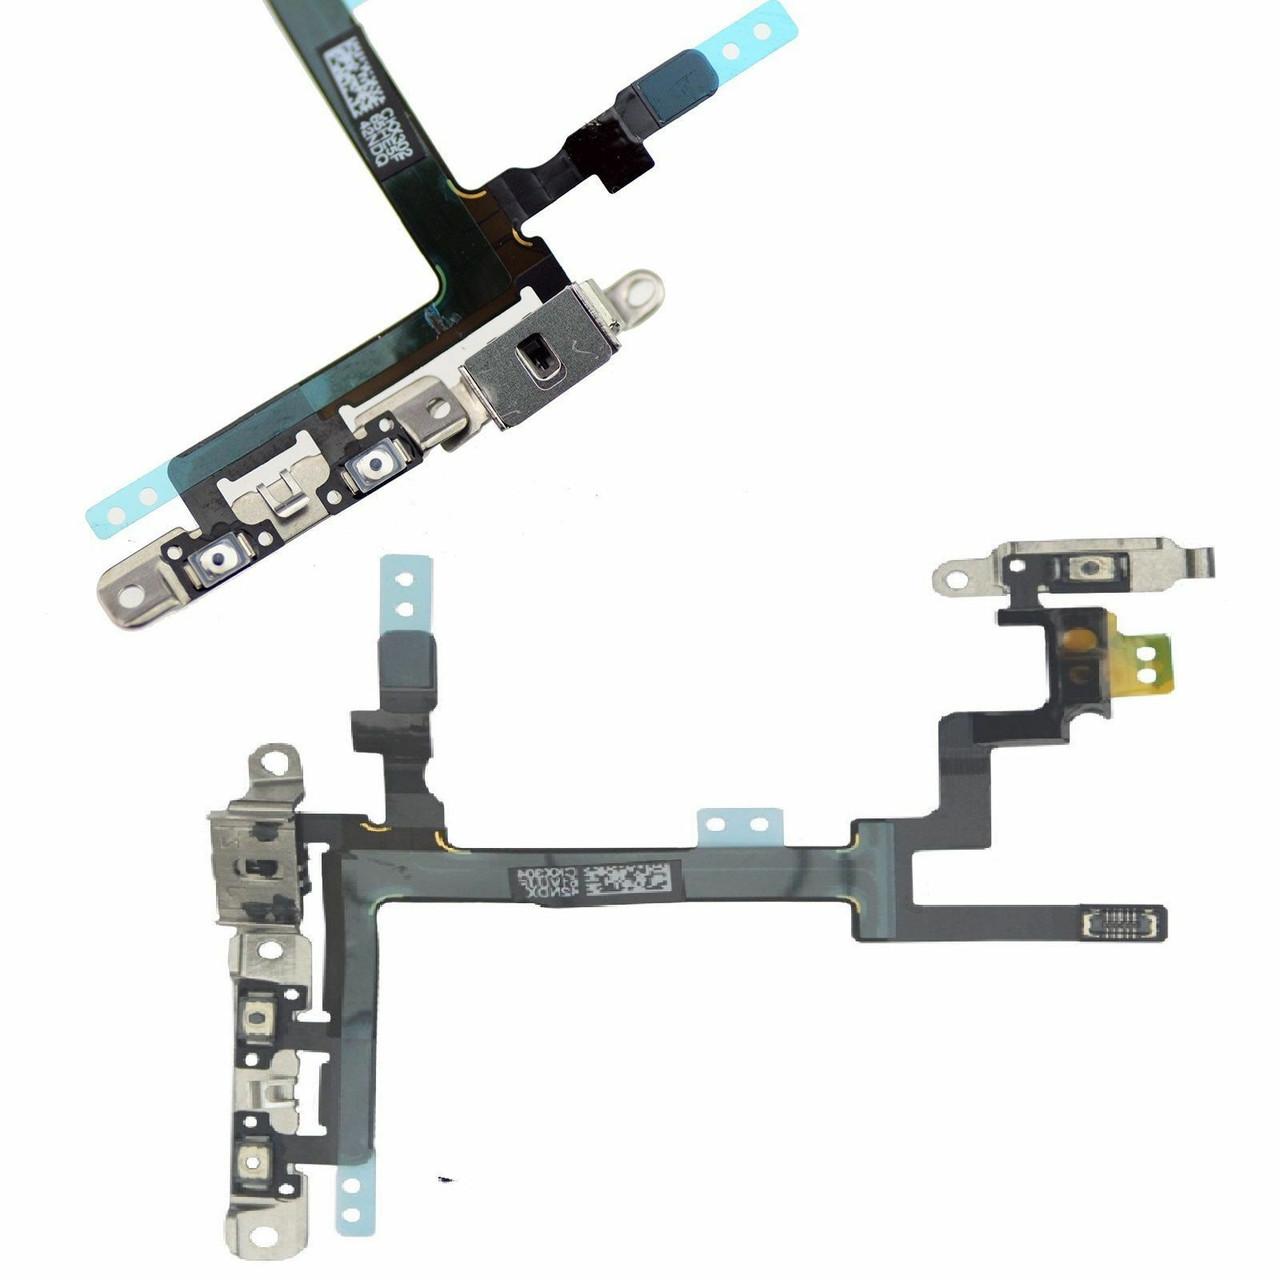 OEM SPEC Power Button Volume Mute Button Flex Cable Metal Bracket For iPhone 5